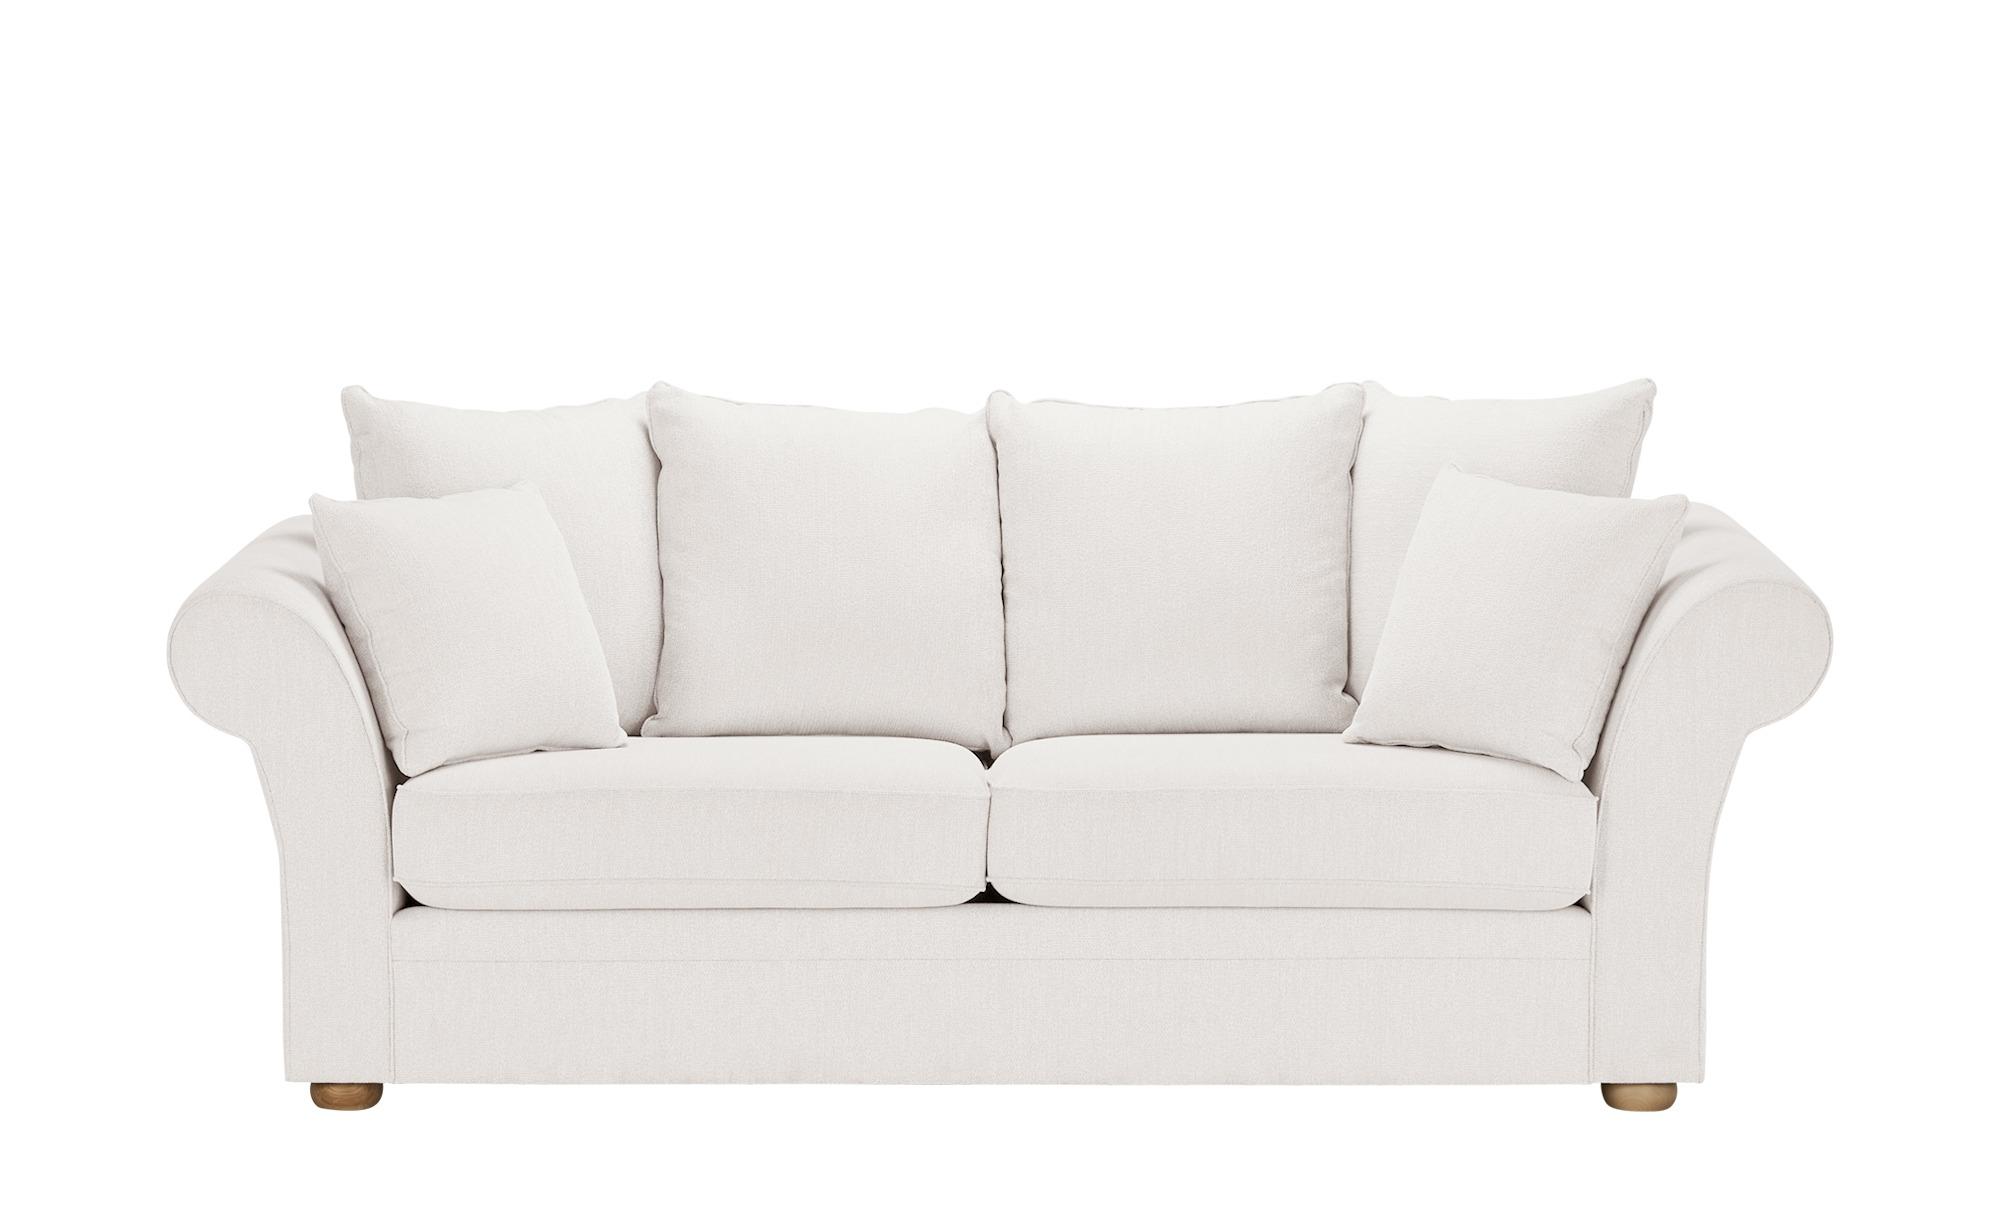 SOHO Sofa  Olivia ¦ creme ¦ Maße (cm): B: 240 H: 100 T: 98 Polstermöbel > Sofas > 3-Sitzer - Höffner